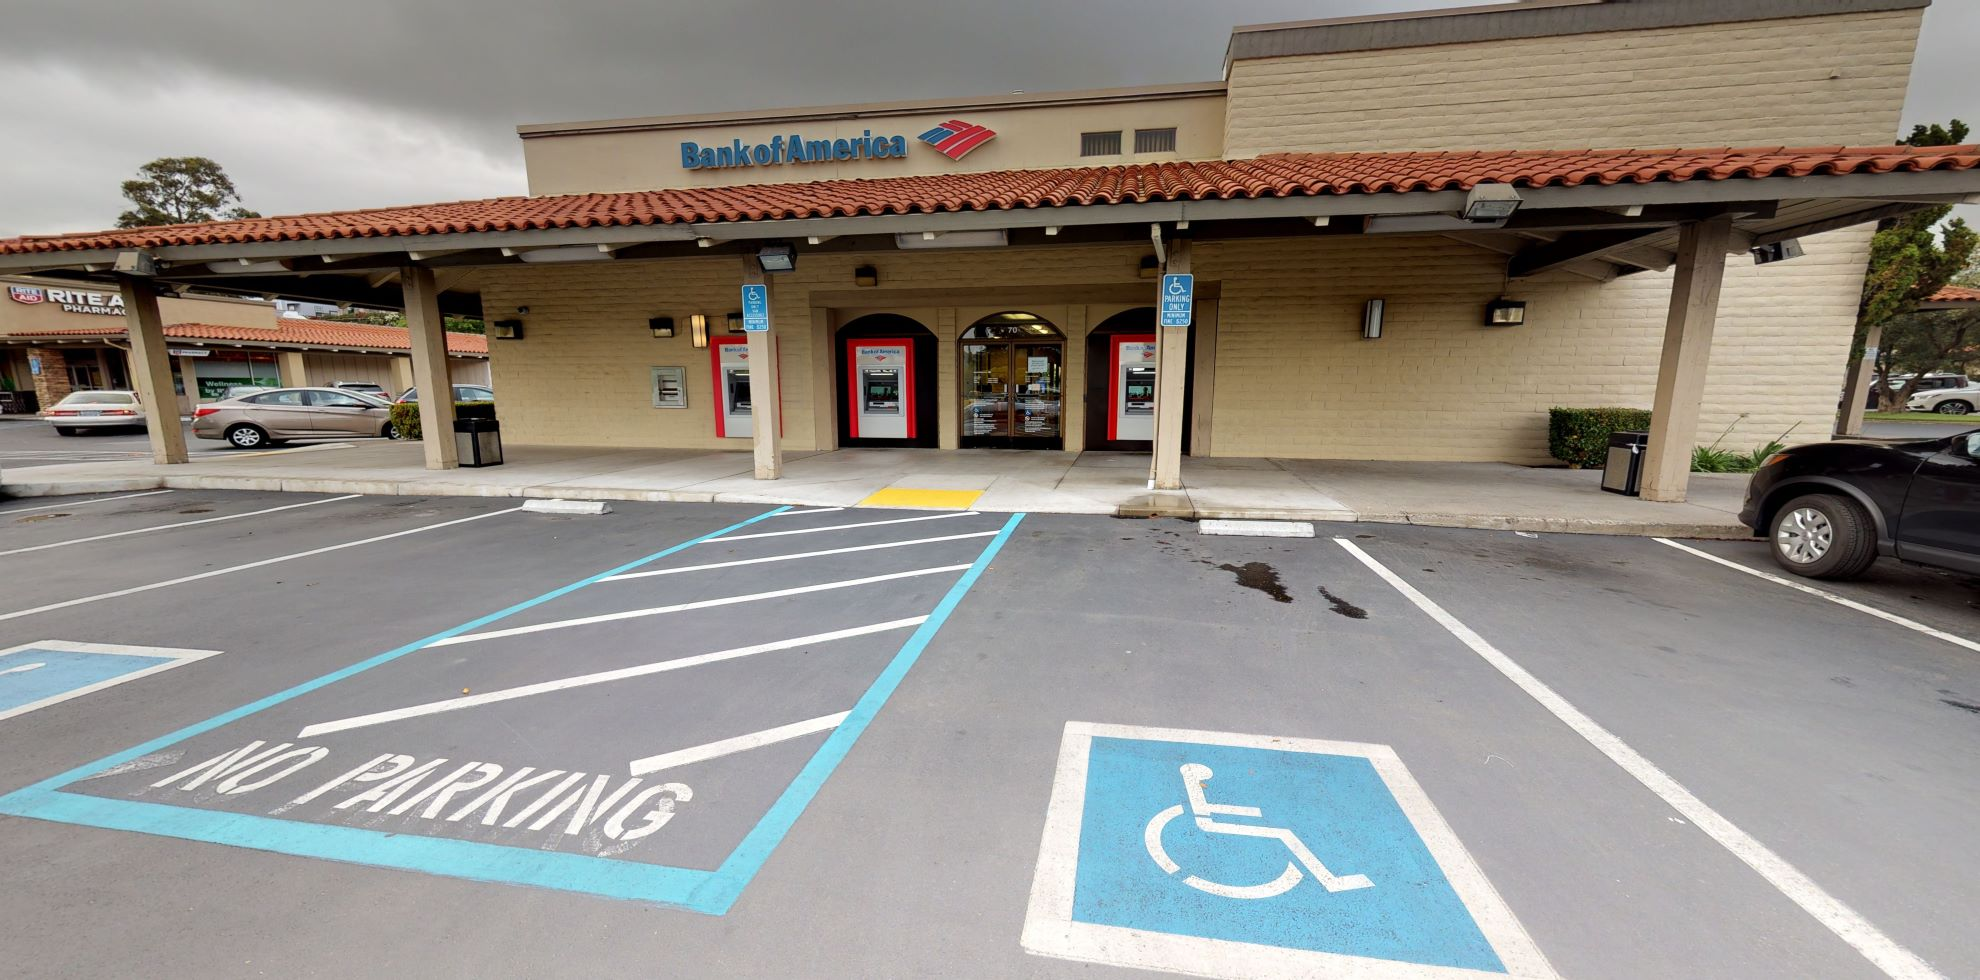 Bank of America financial center with walk-up ATM | 70 Solano Sq, Benicia, CA 94510